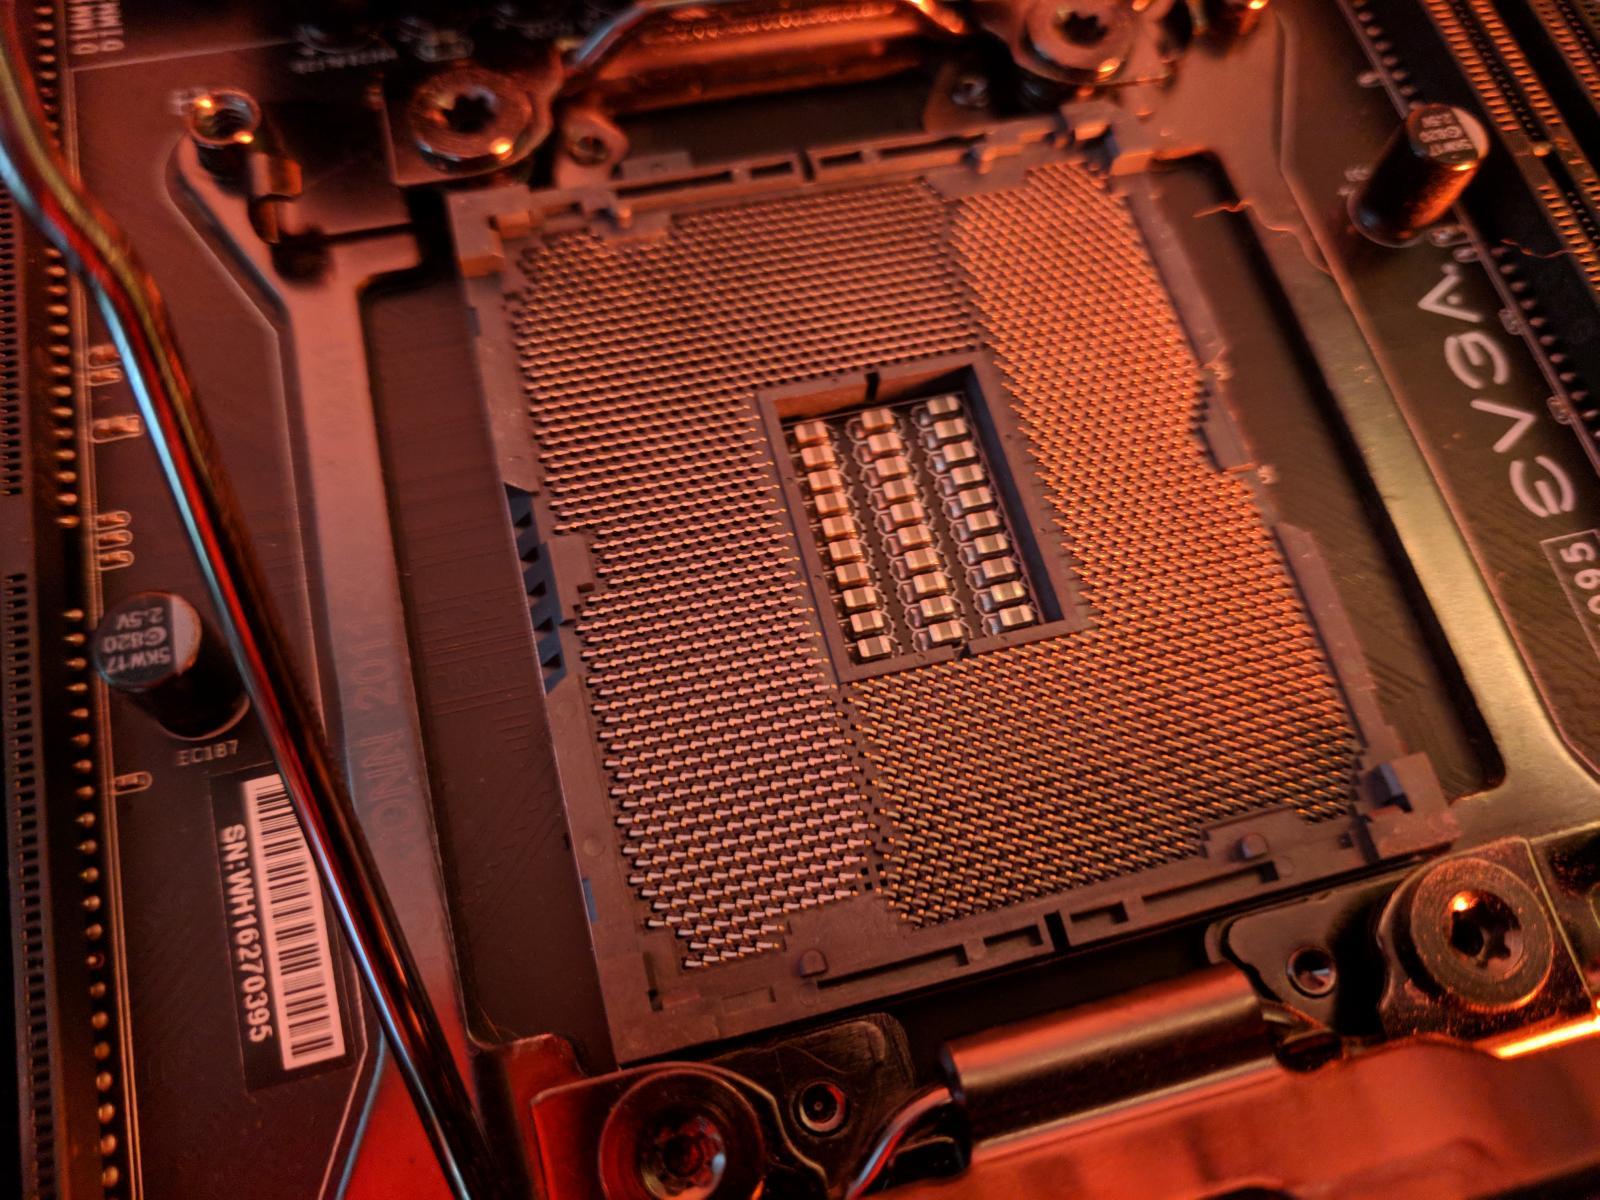 Photo of Intel i7 5930k w/ EVGA Micro2